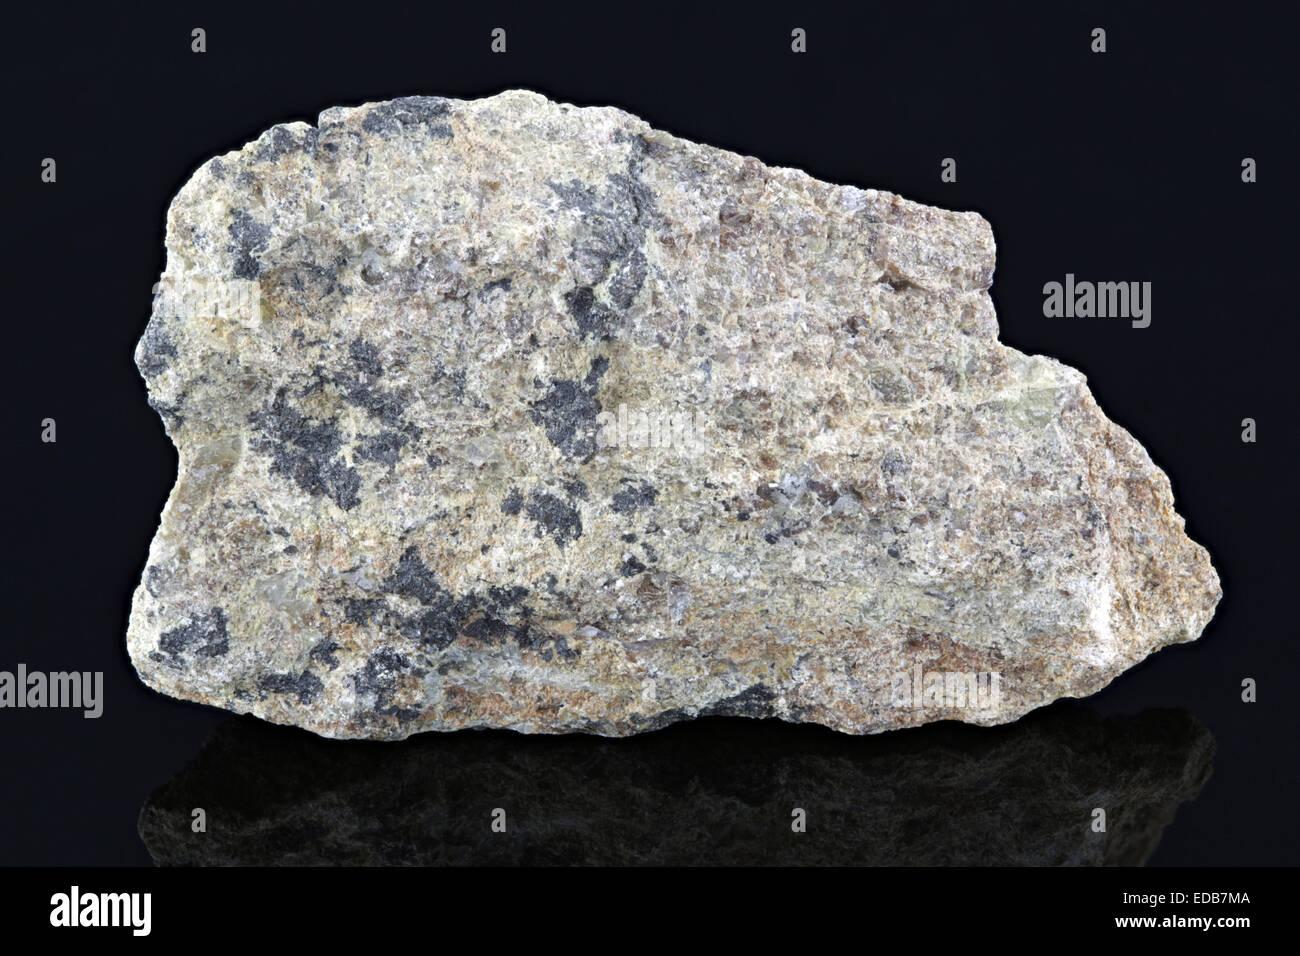 Manganese Ore rock sample - Stock Image